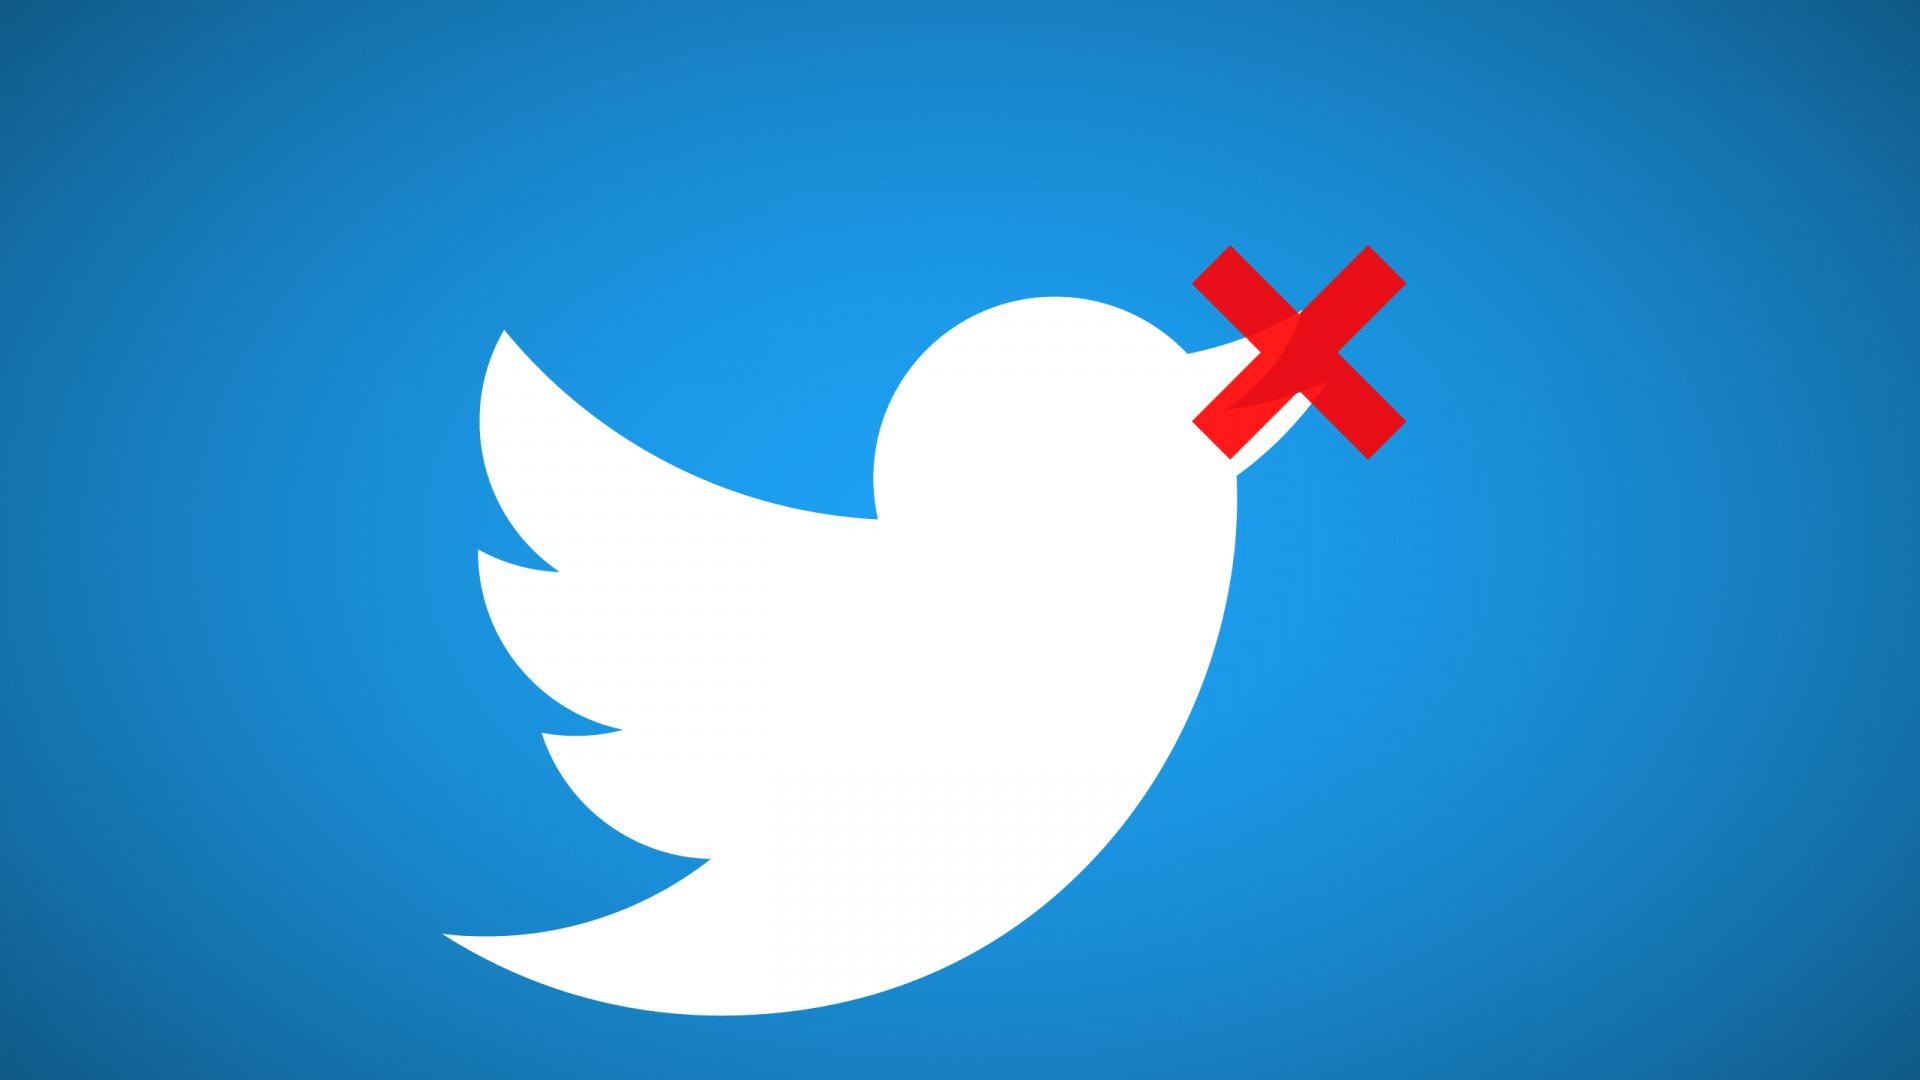 Роскомнадзор продлили замедление Twitter на территории РФ до15 мая